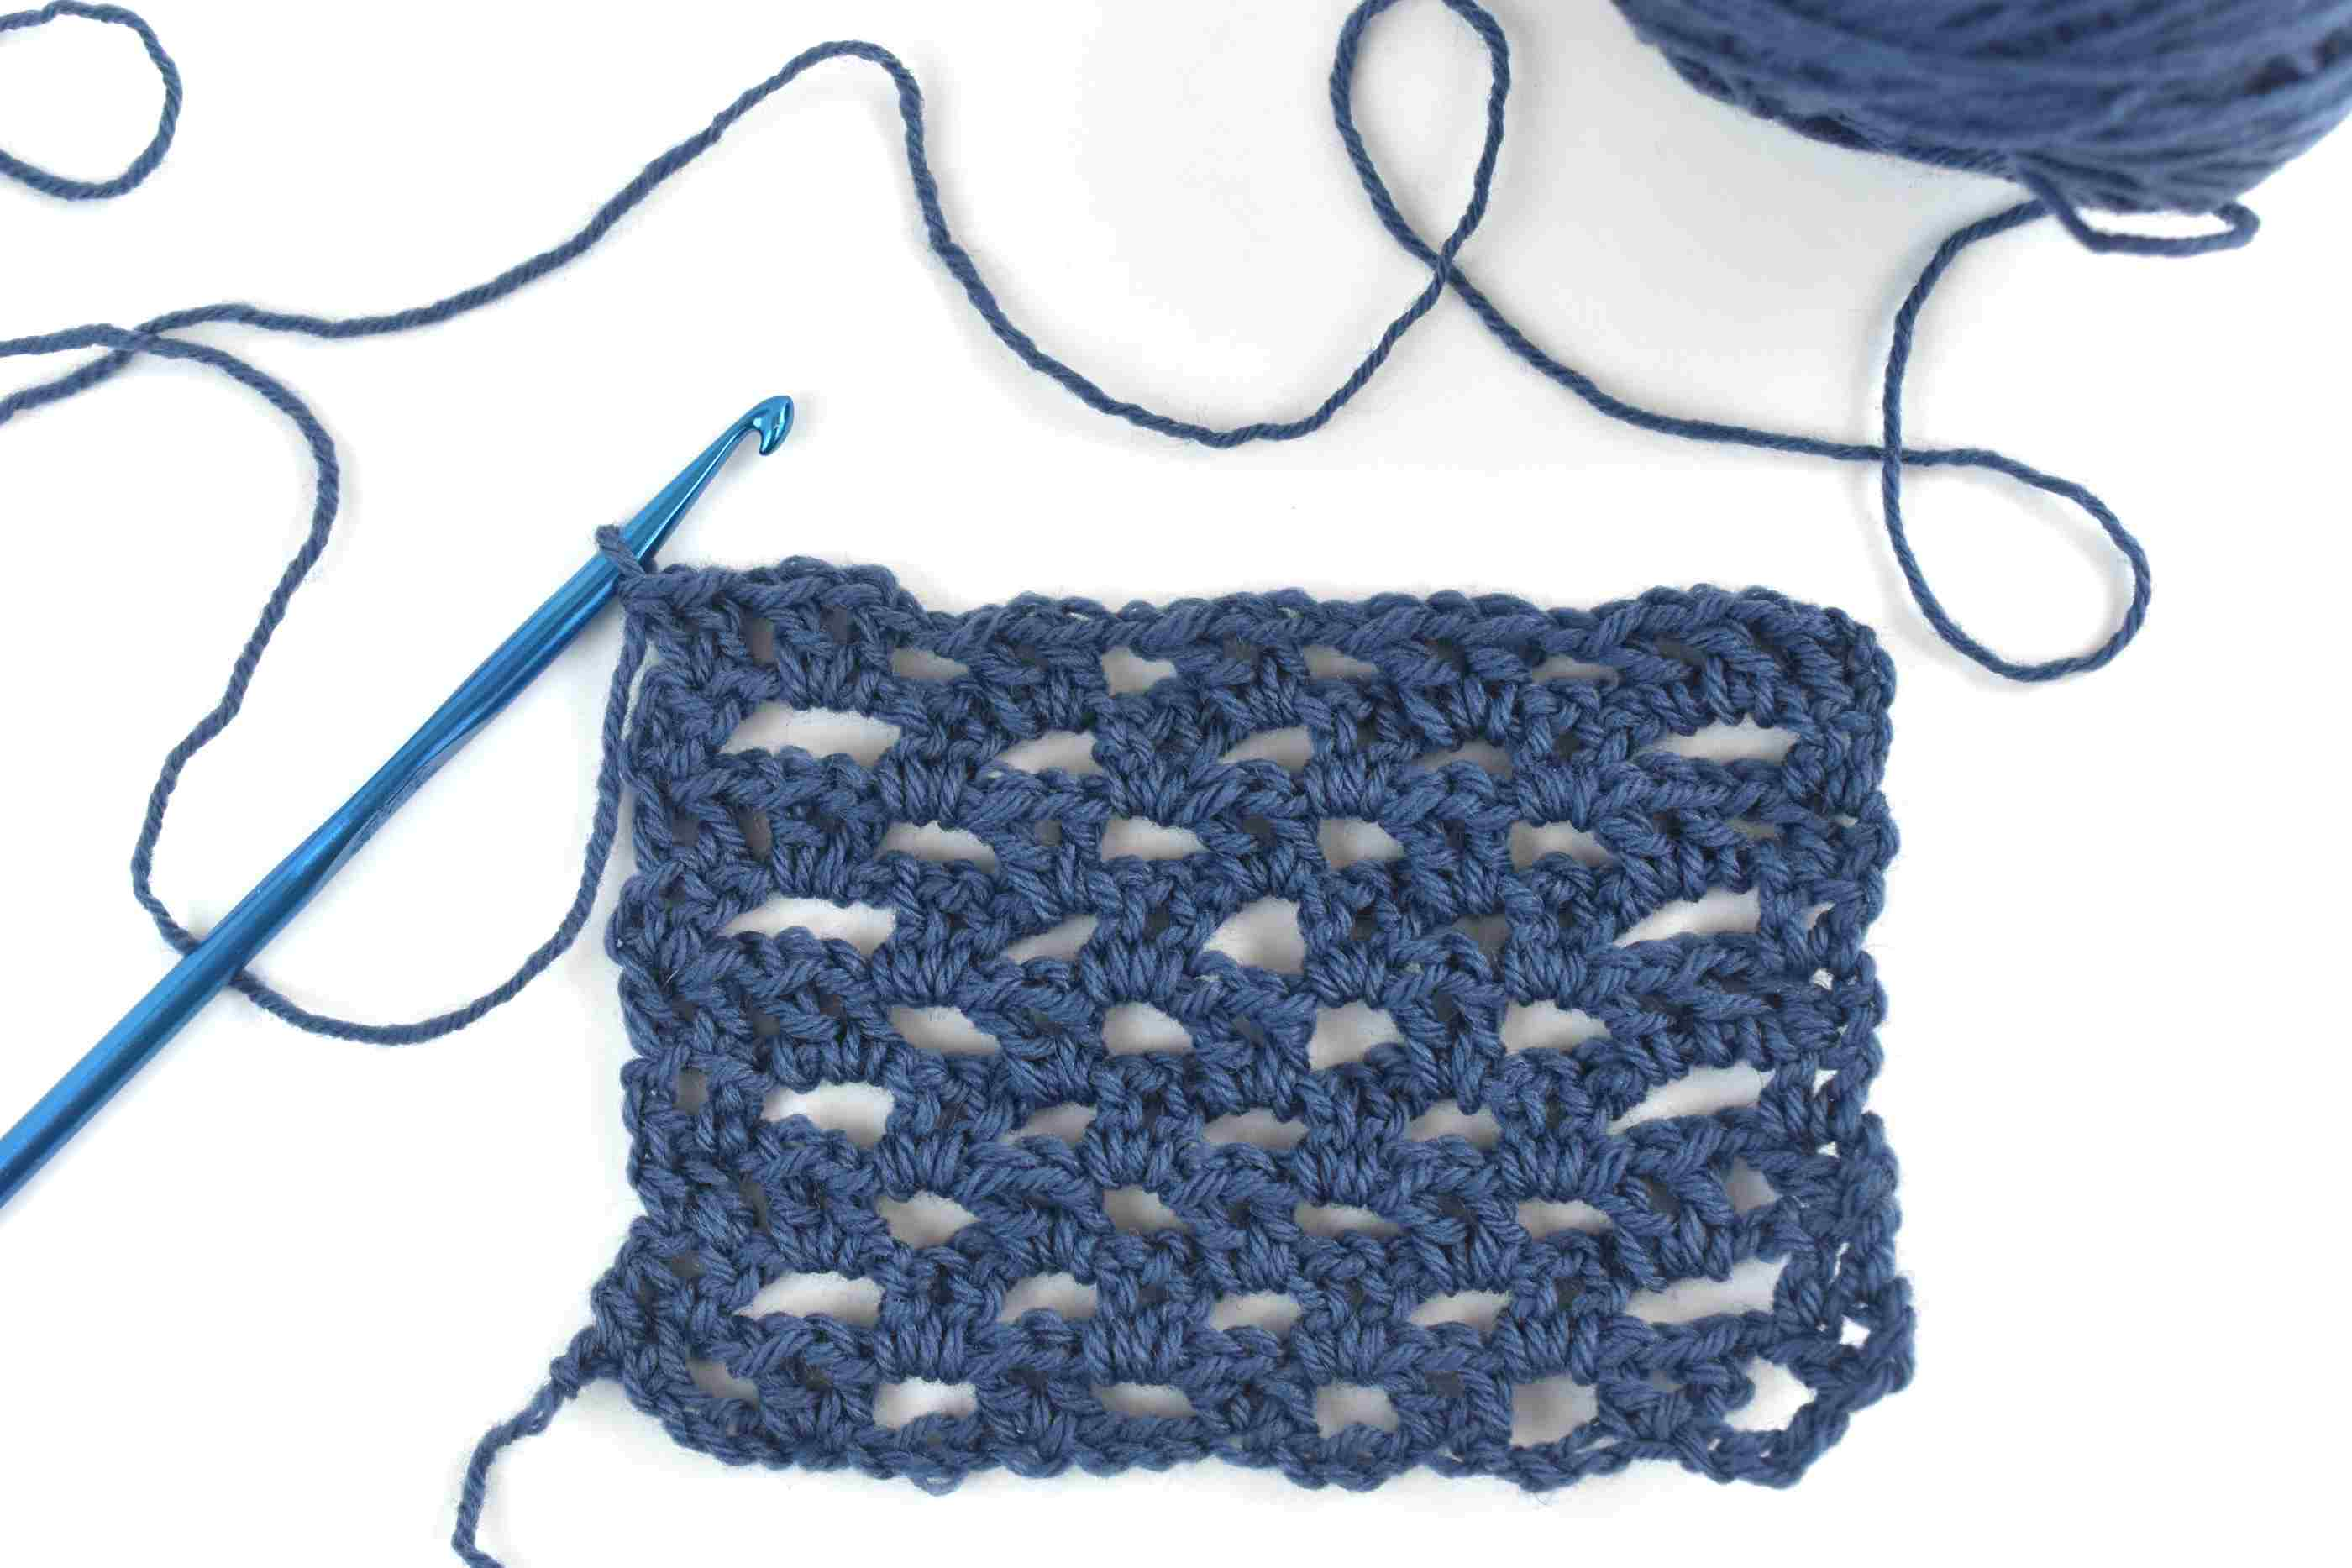 V-Stitch With a Brick Repeat